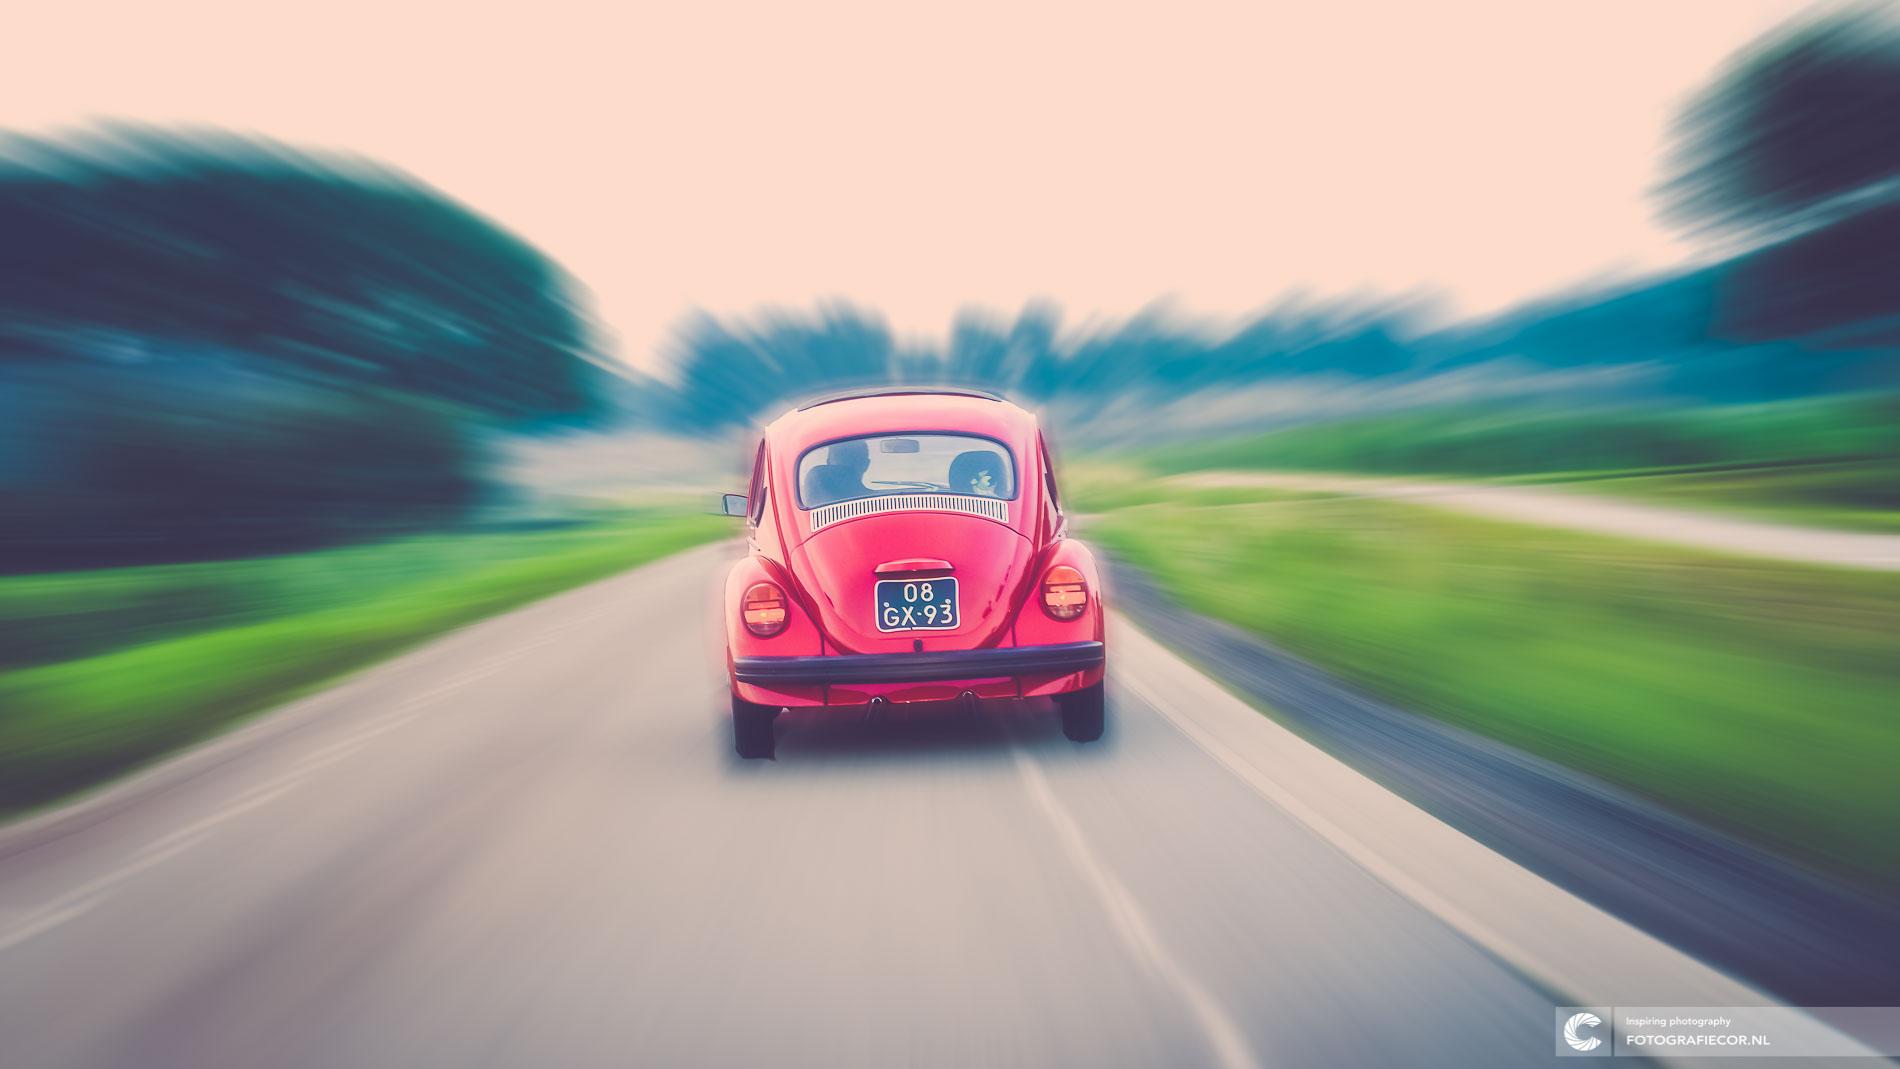 Rijdende rode Beetle met vage strepen | foto bewerking